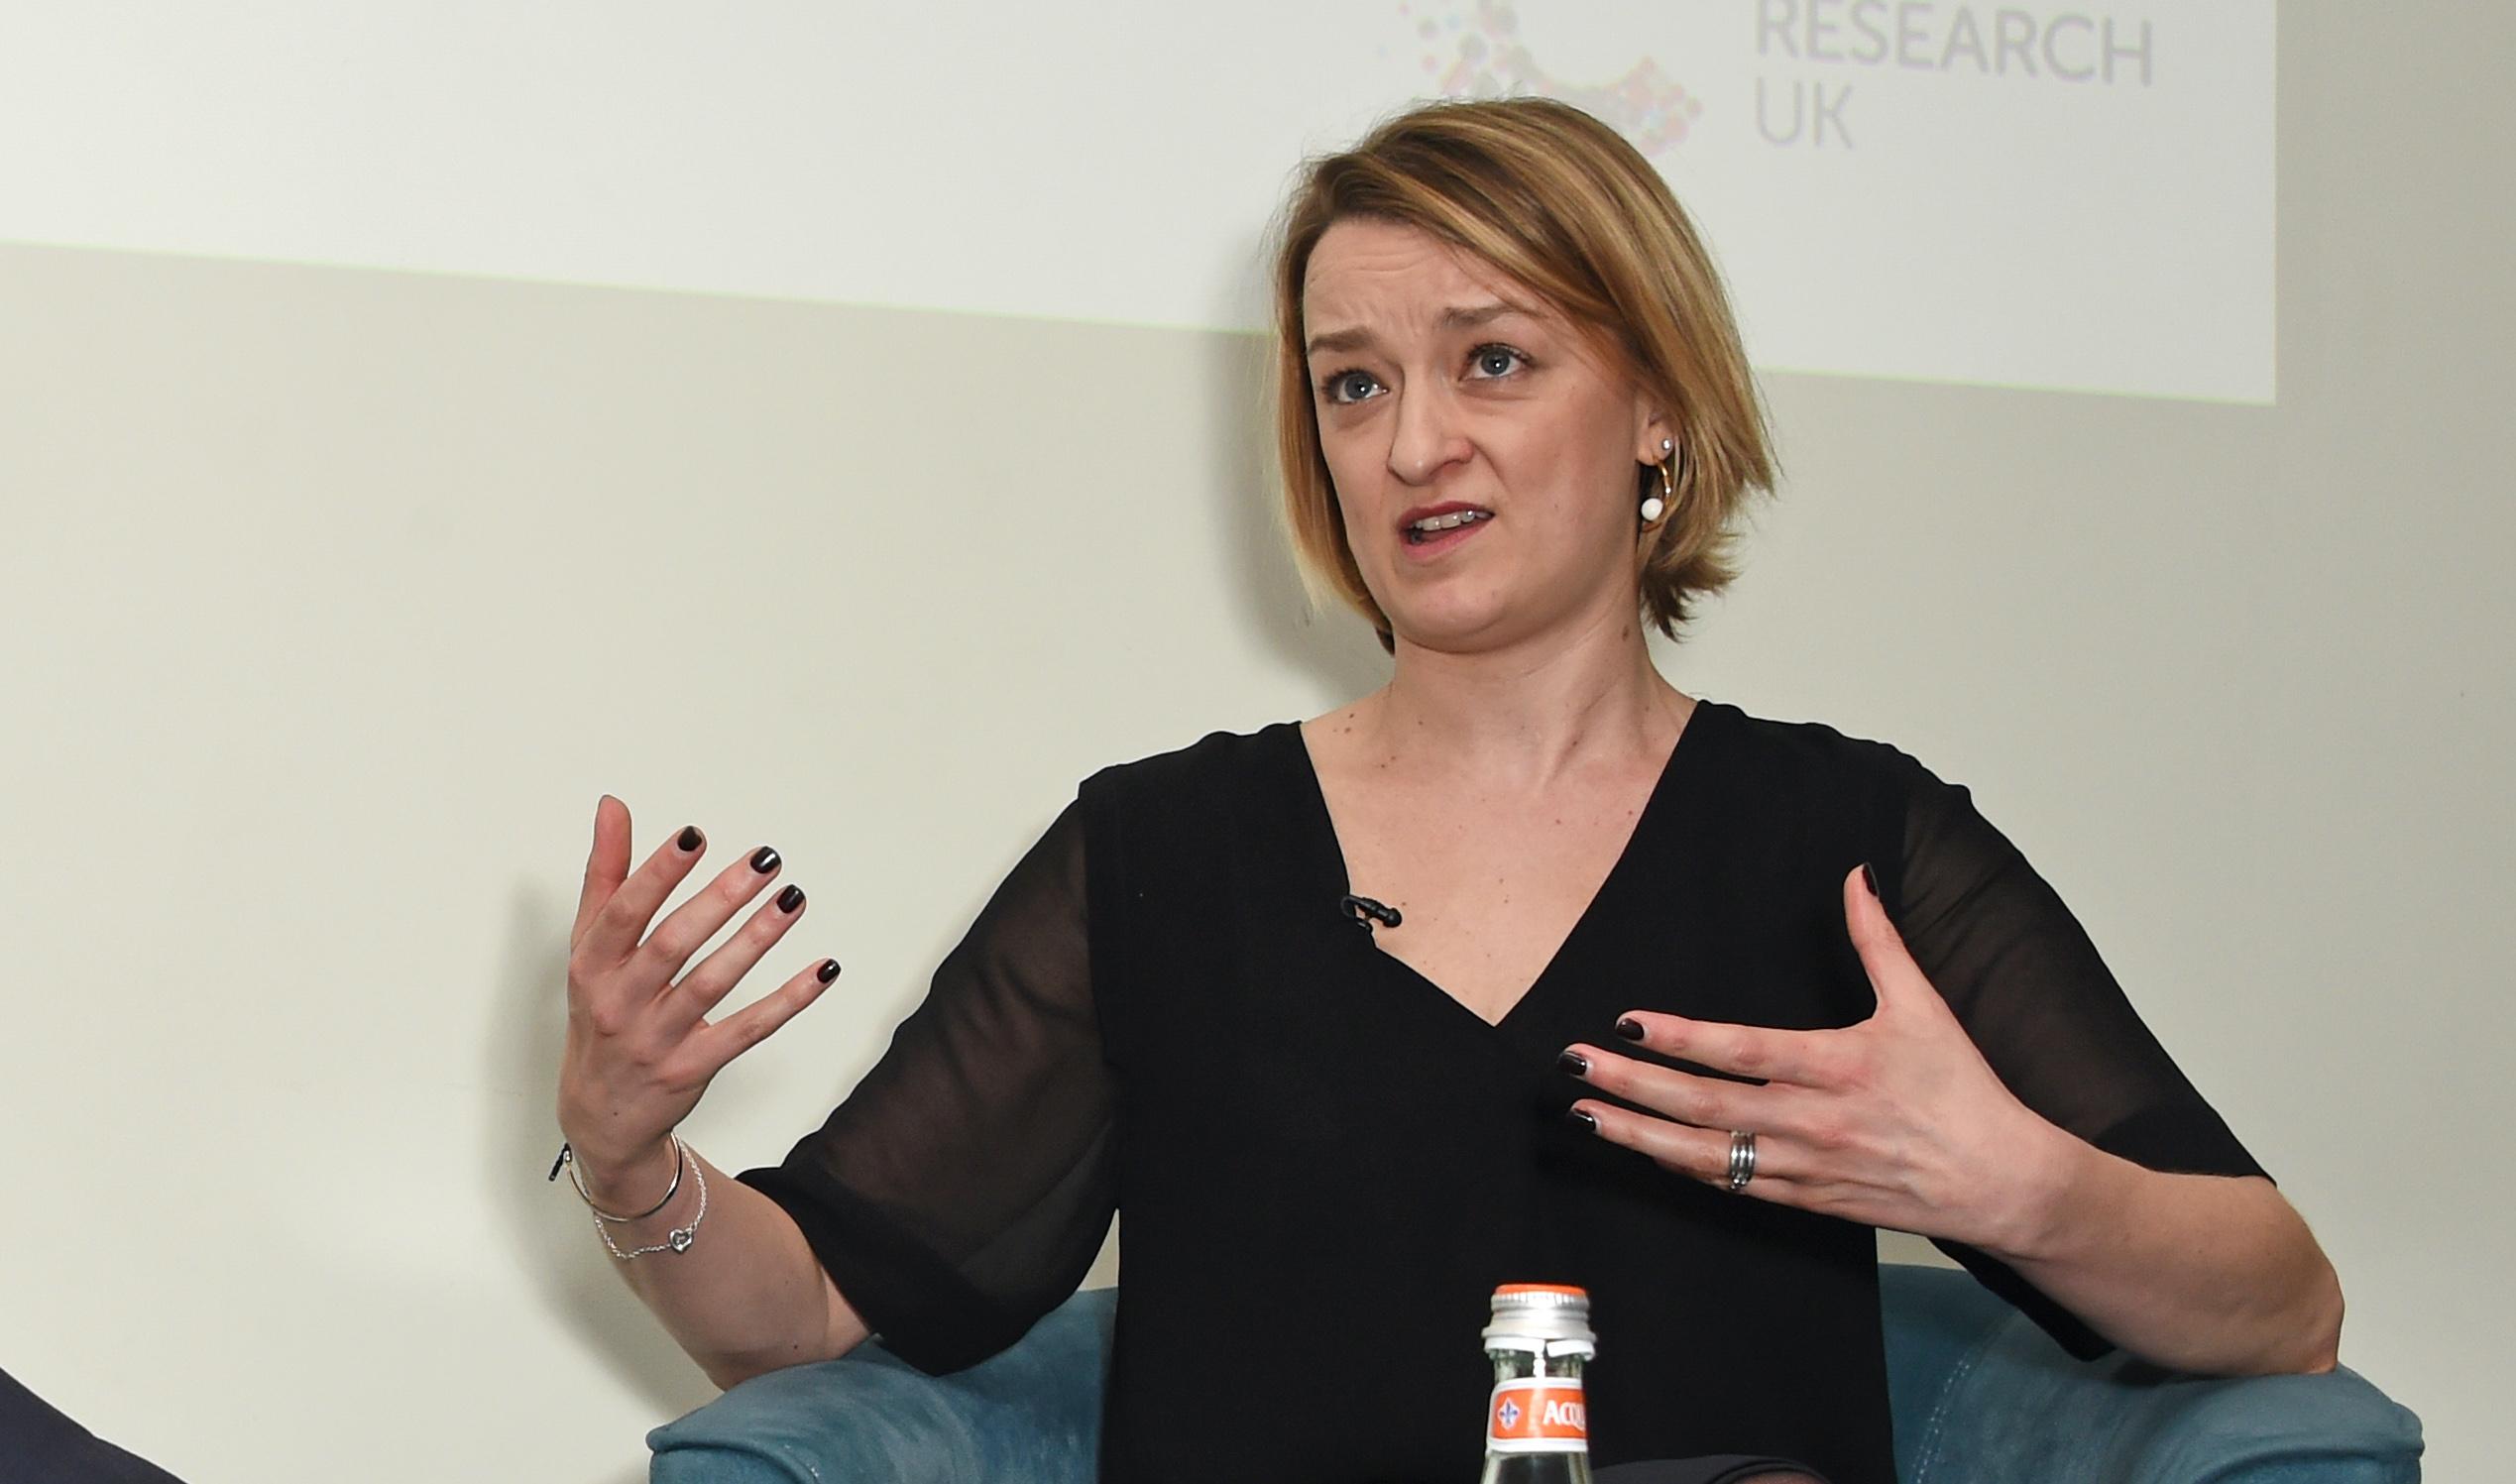 Laura Kuennsberg was accused of defending Dominic Cummings. (Dave Benett/Getty Images)